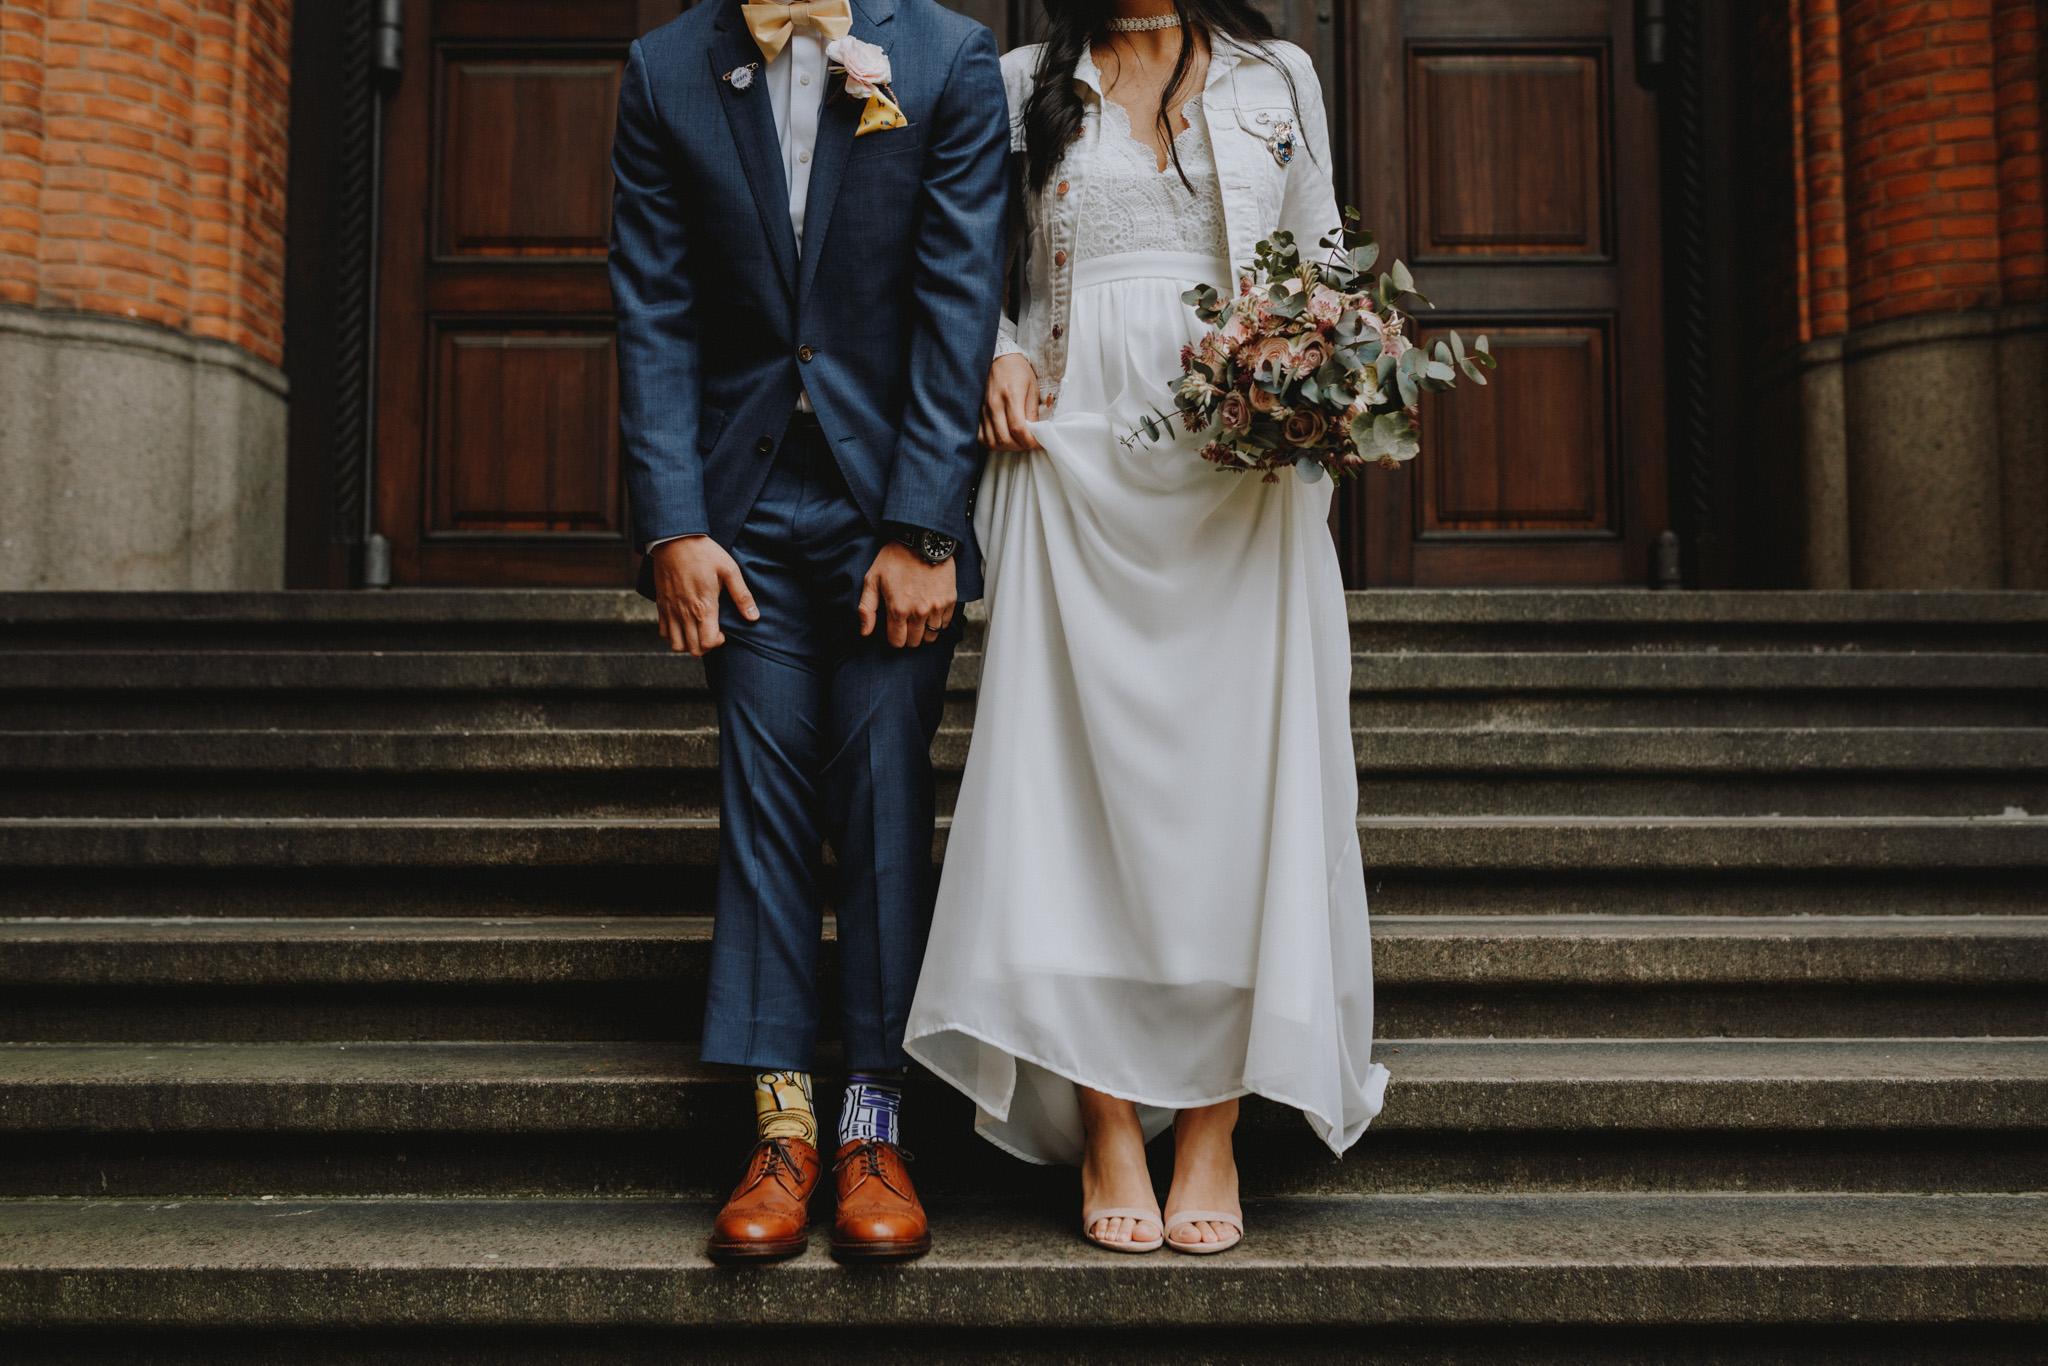 Copenhagen_Wedding_Photographer_Elopement_Photographer_Europe (73 of 100).jpg